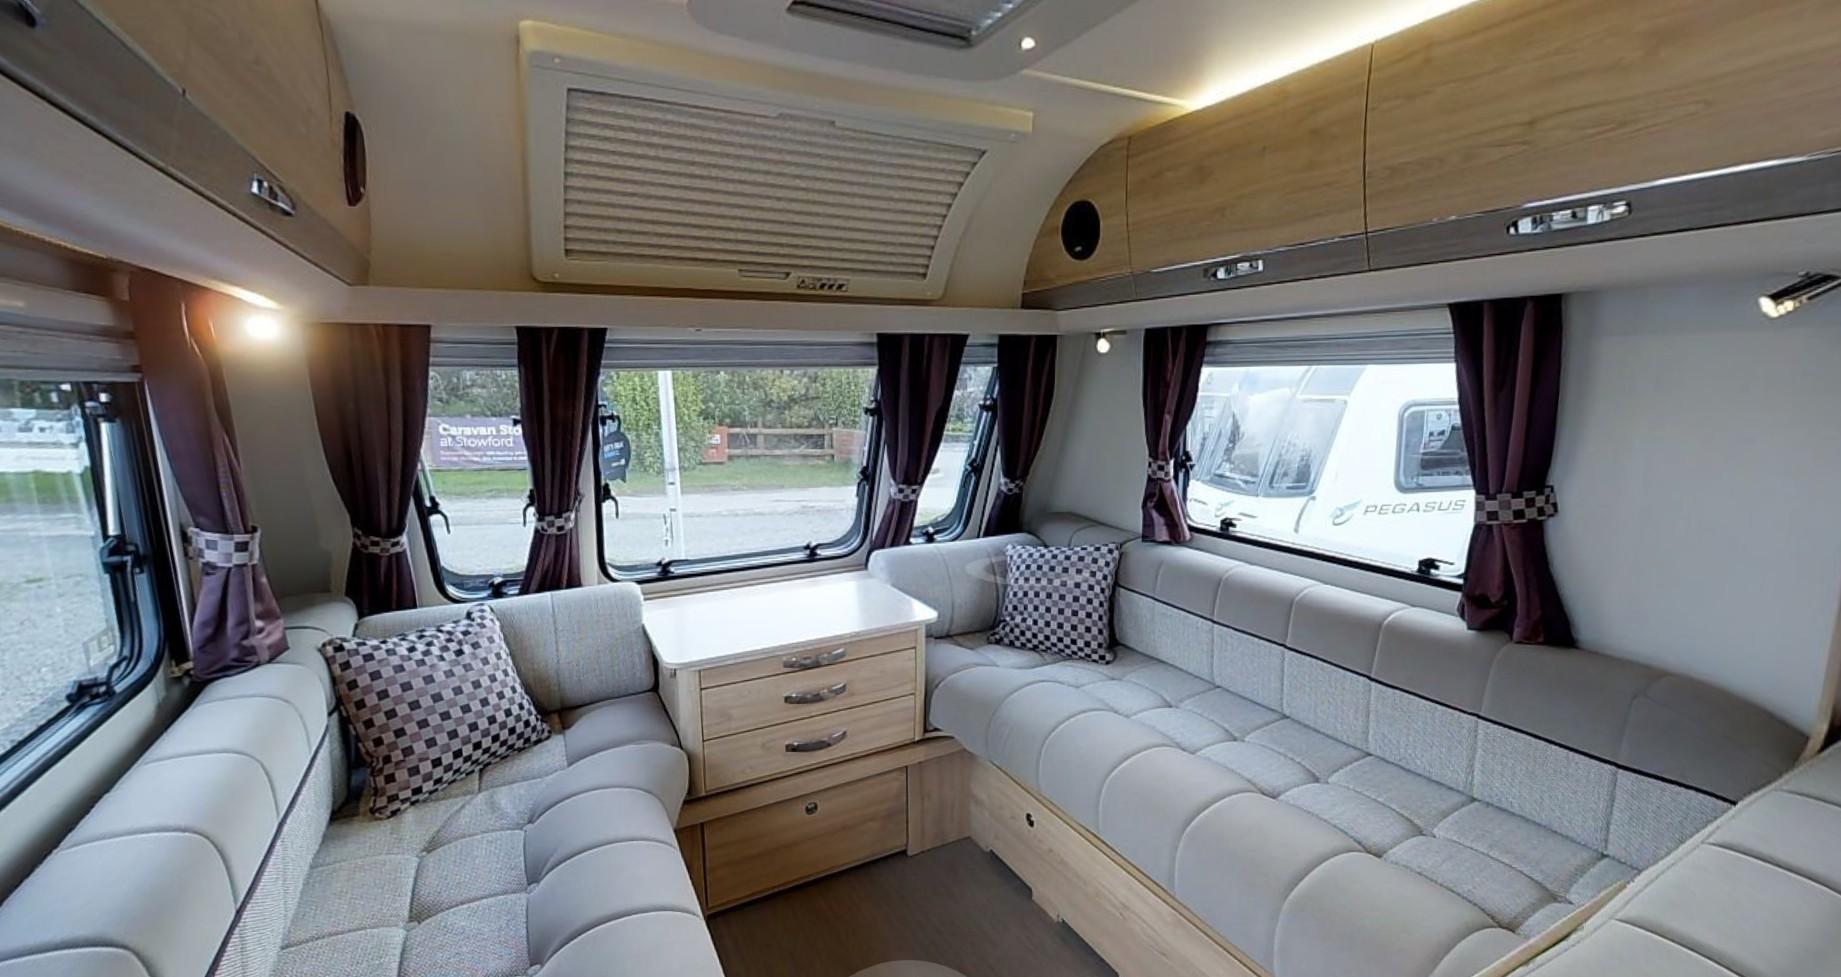 Stowford Caravan Park | Matterport Virtual Tour | Panoptic